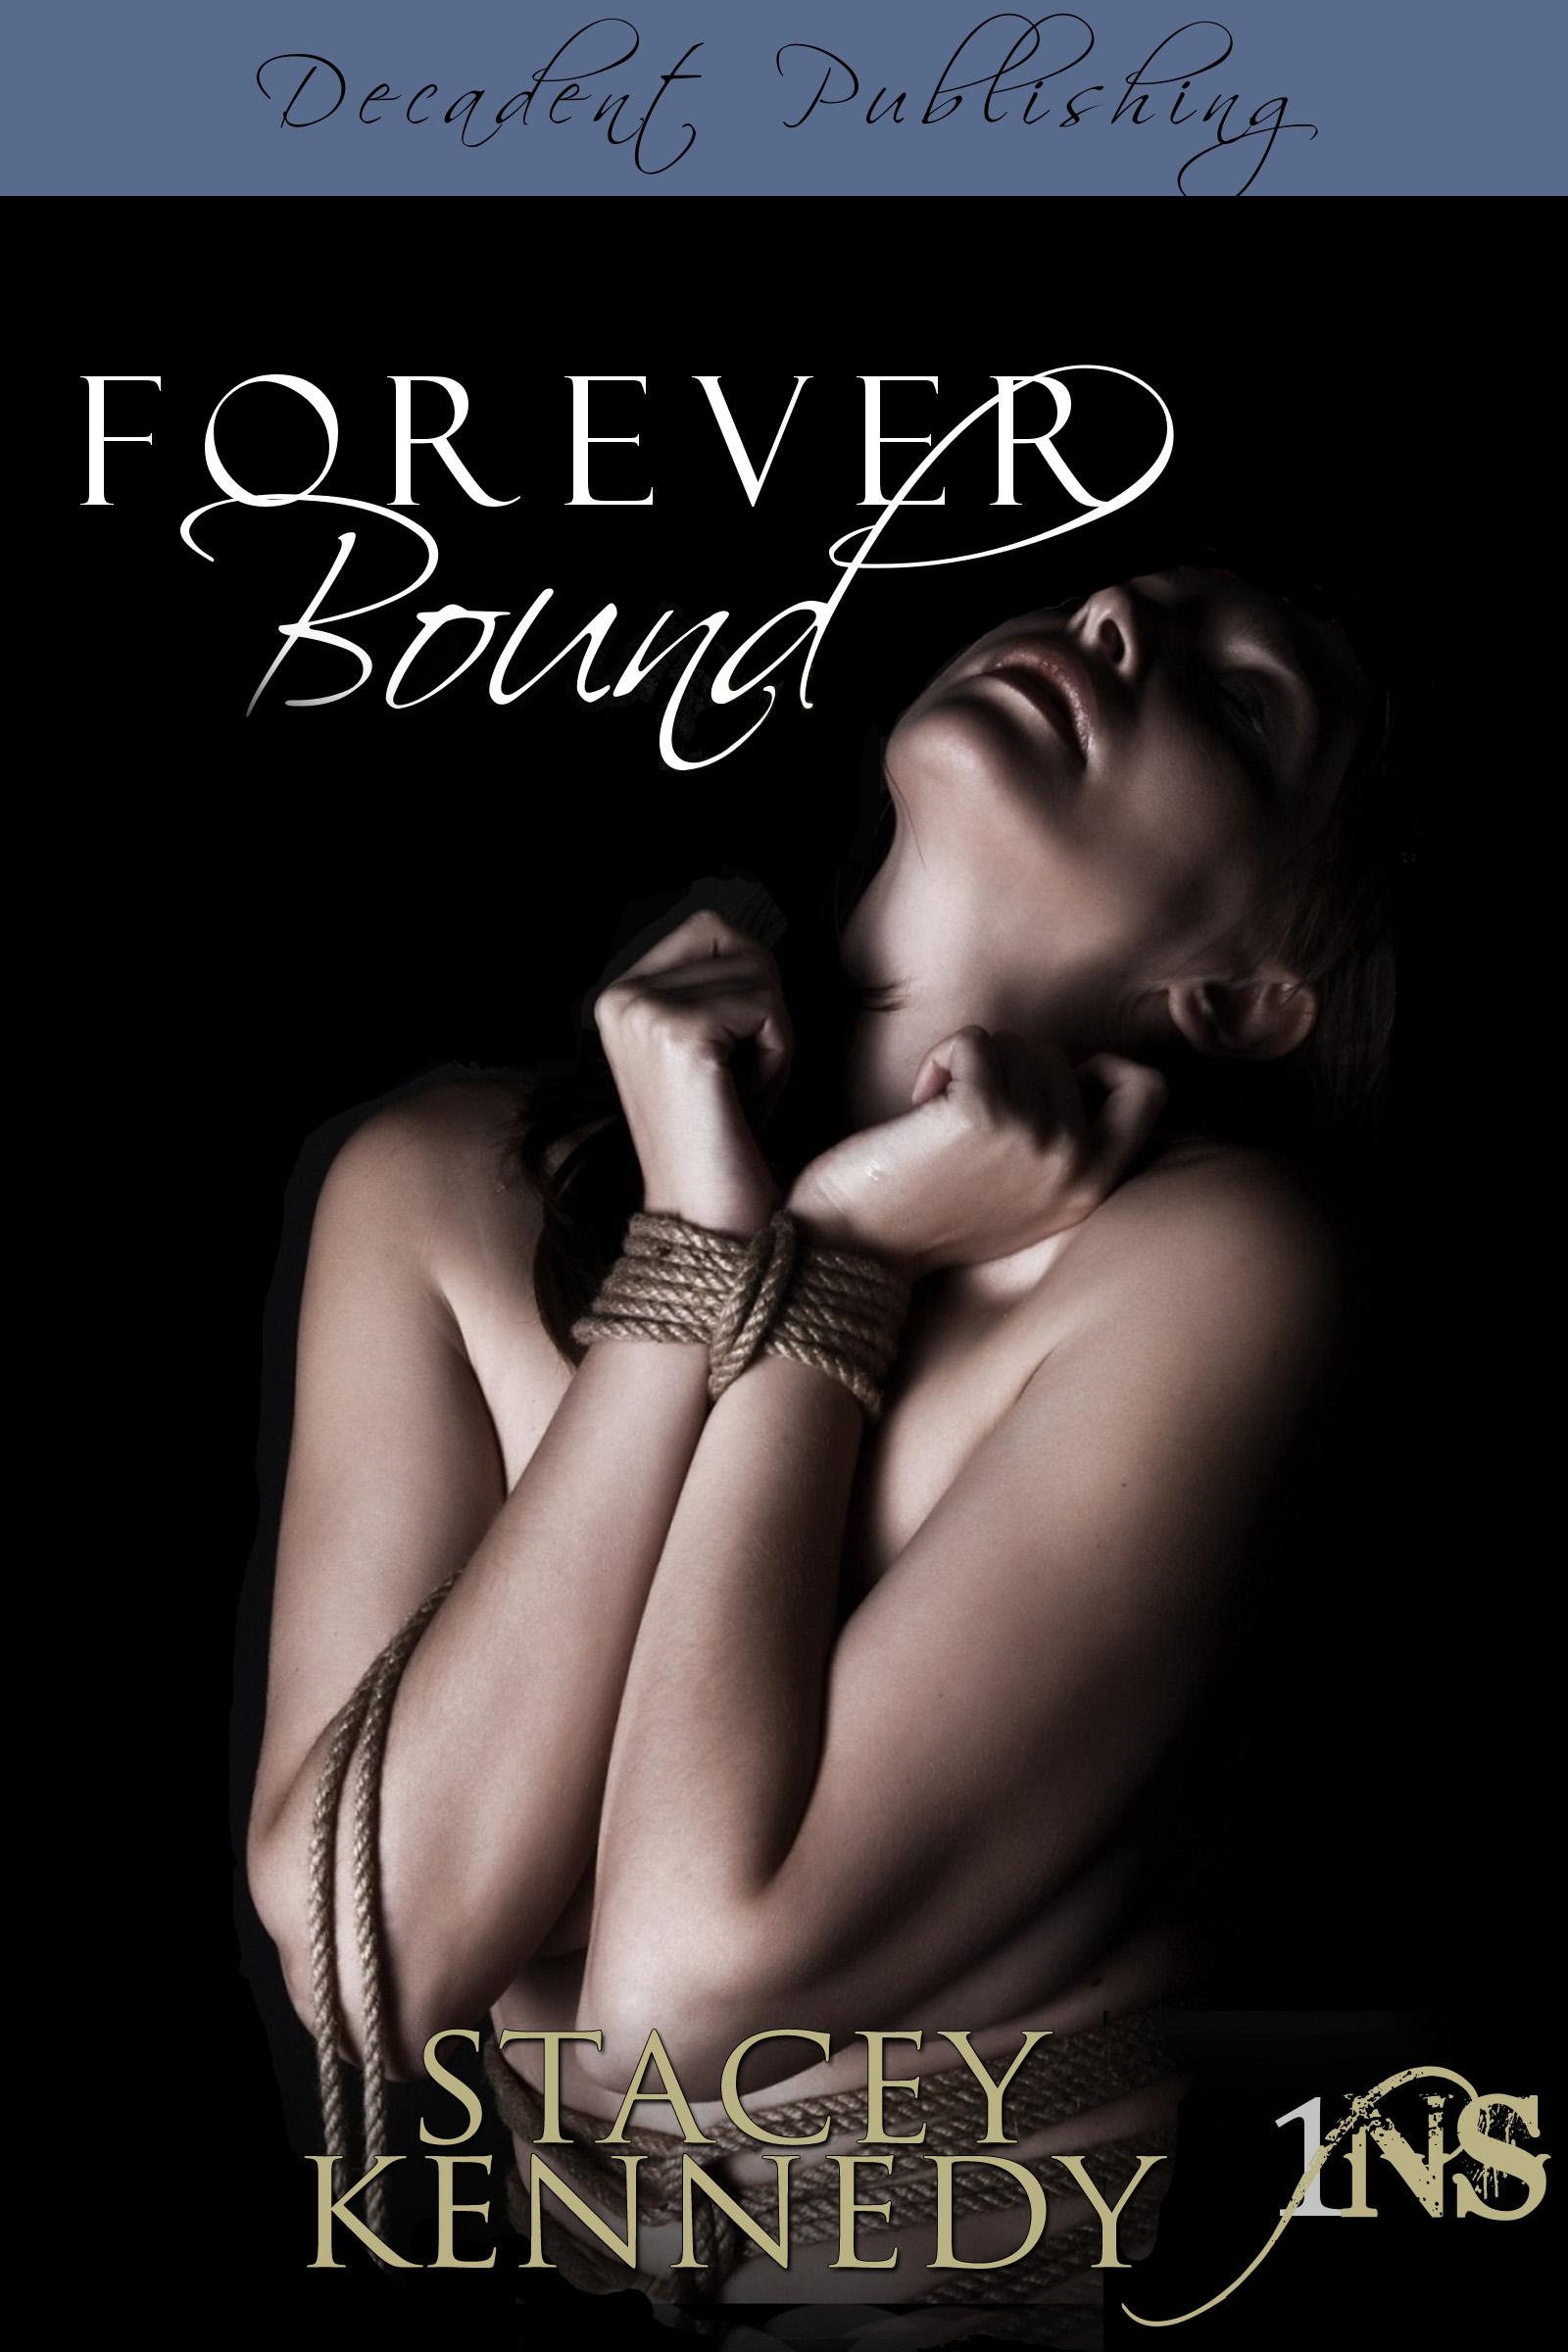 ForeverBound